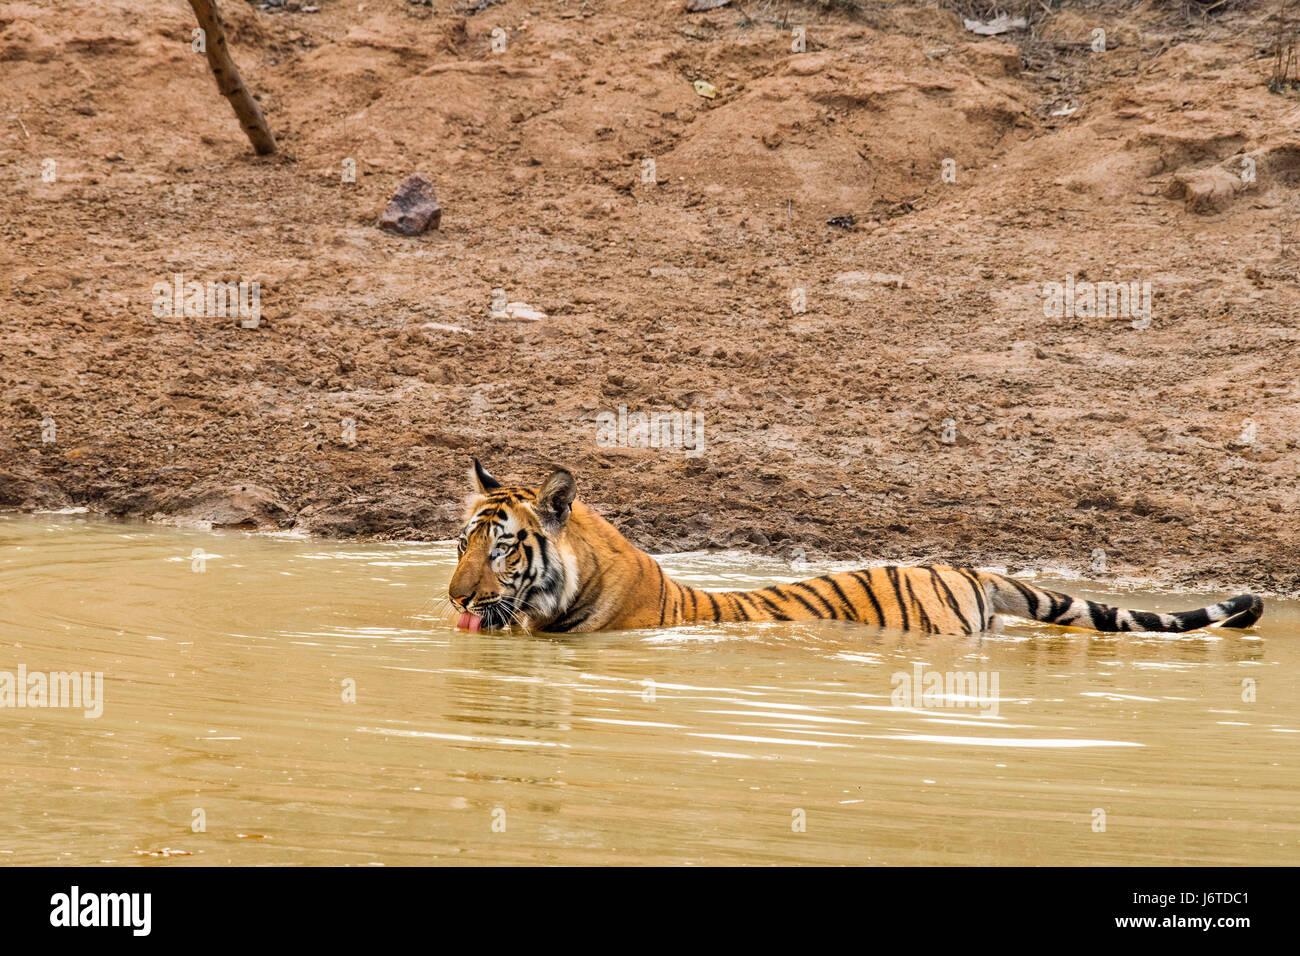 Tigers of Bandhavgarh India - Stock Image